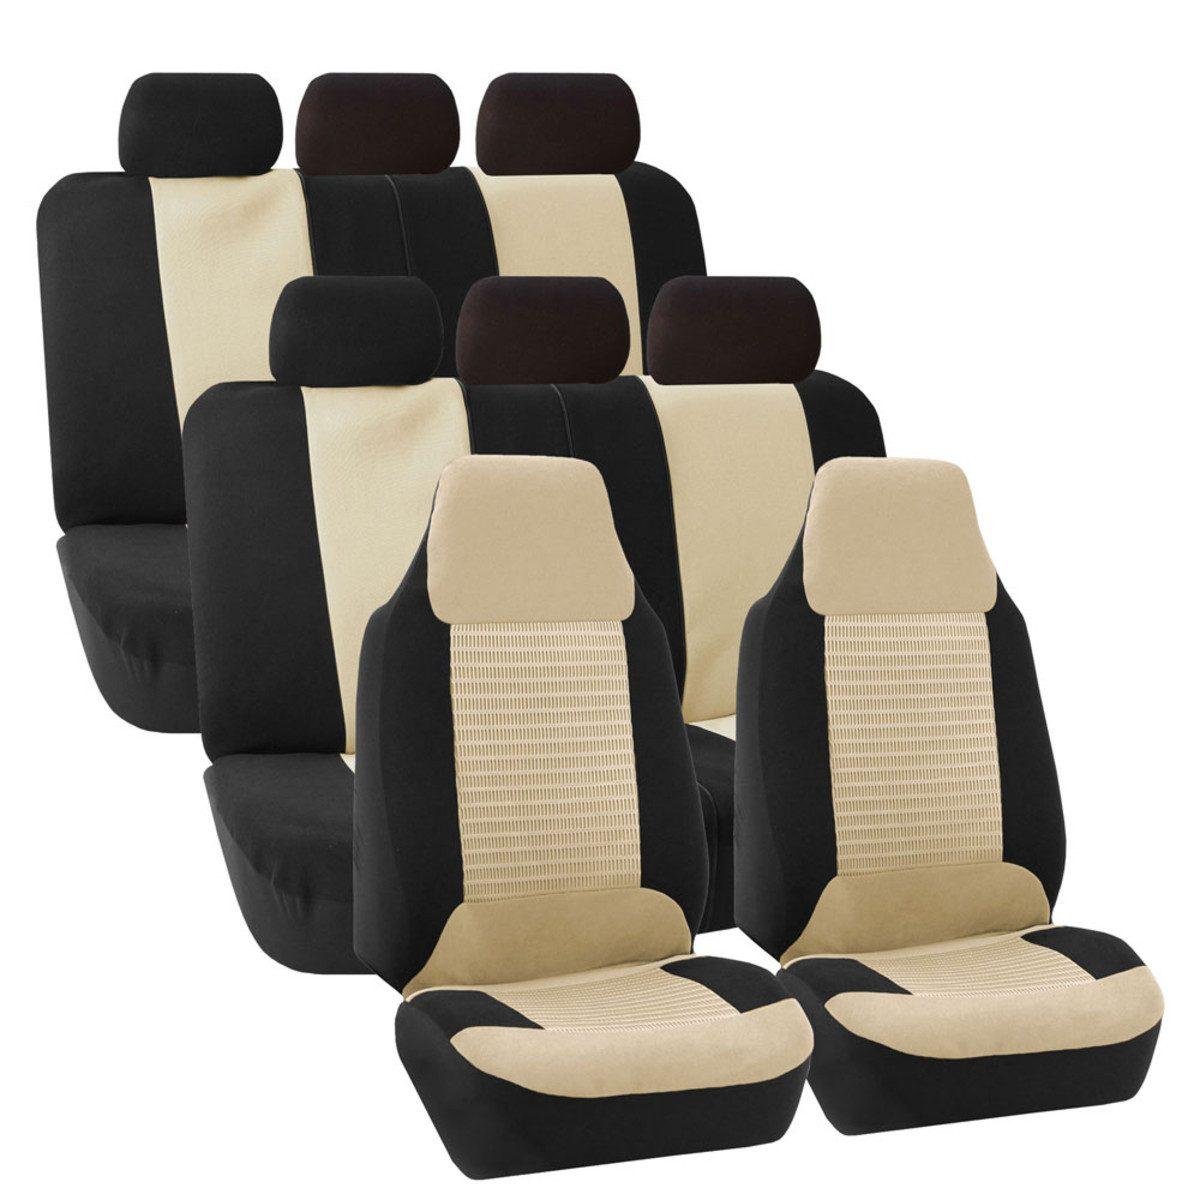 FB107128BEIGE seat cover